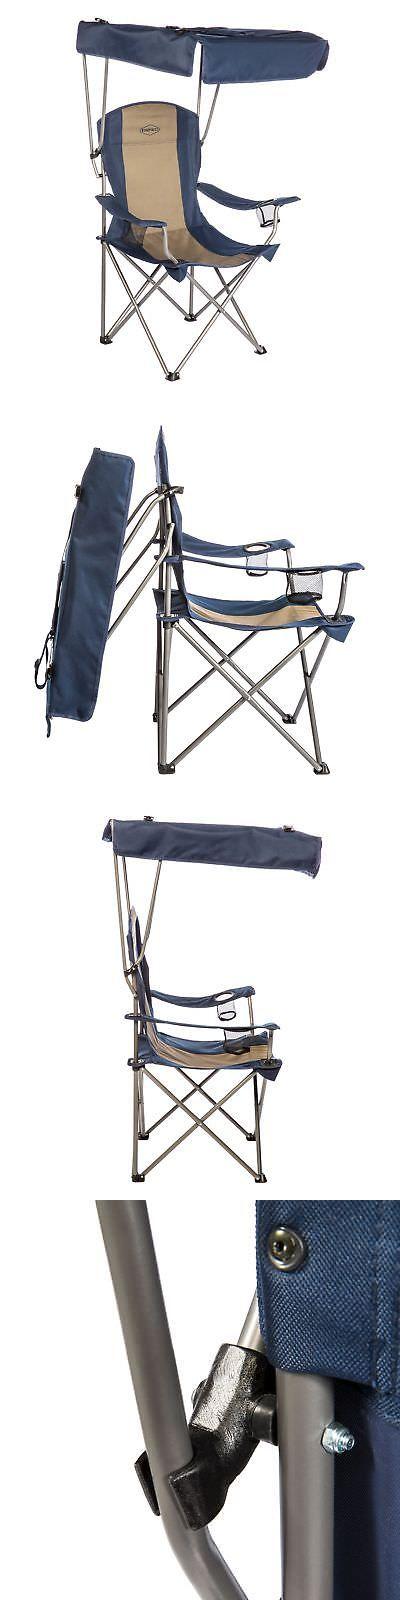 Camping Furniture 16038 Kamp Rite Cc463 Outdoor Tailgating Camping